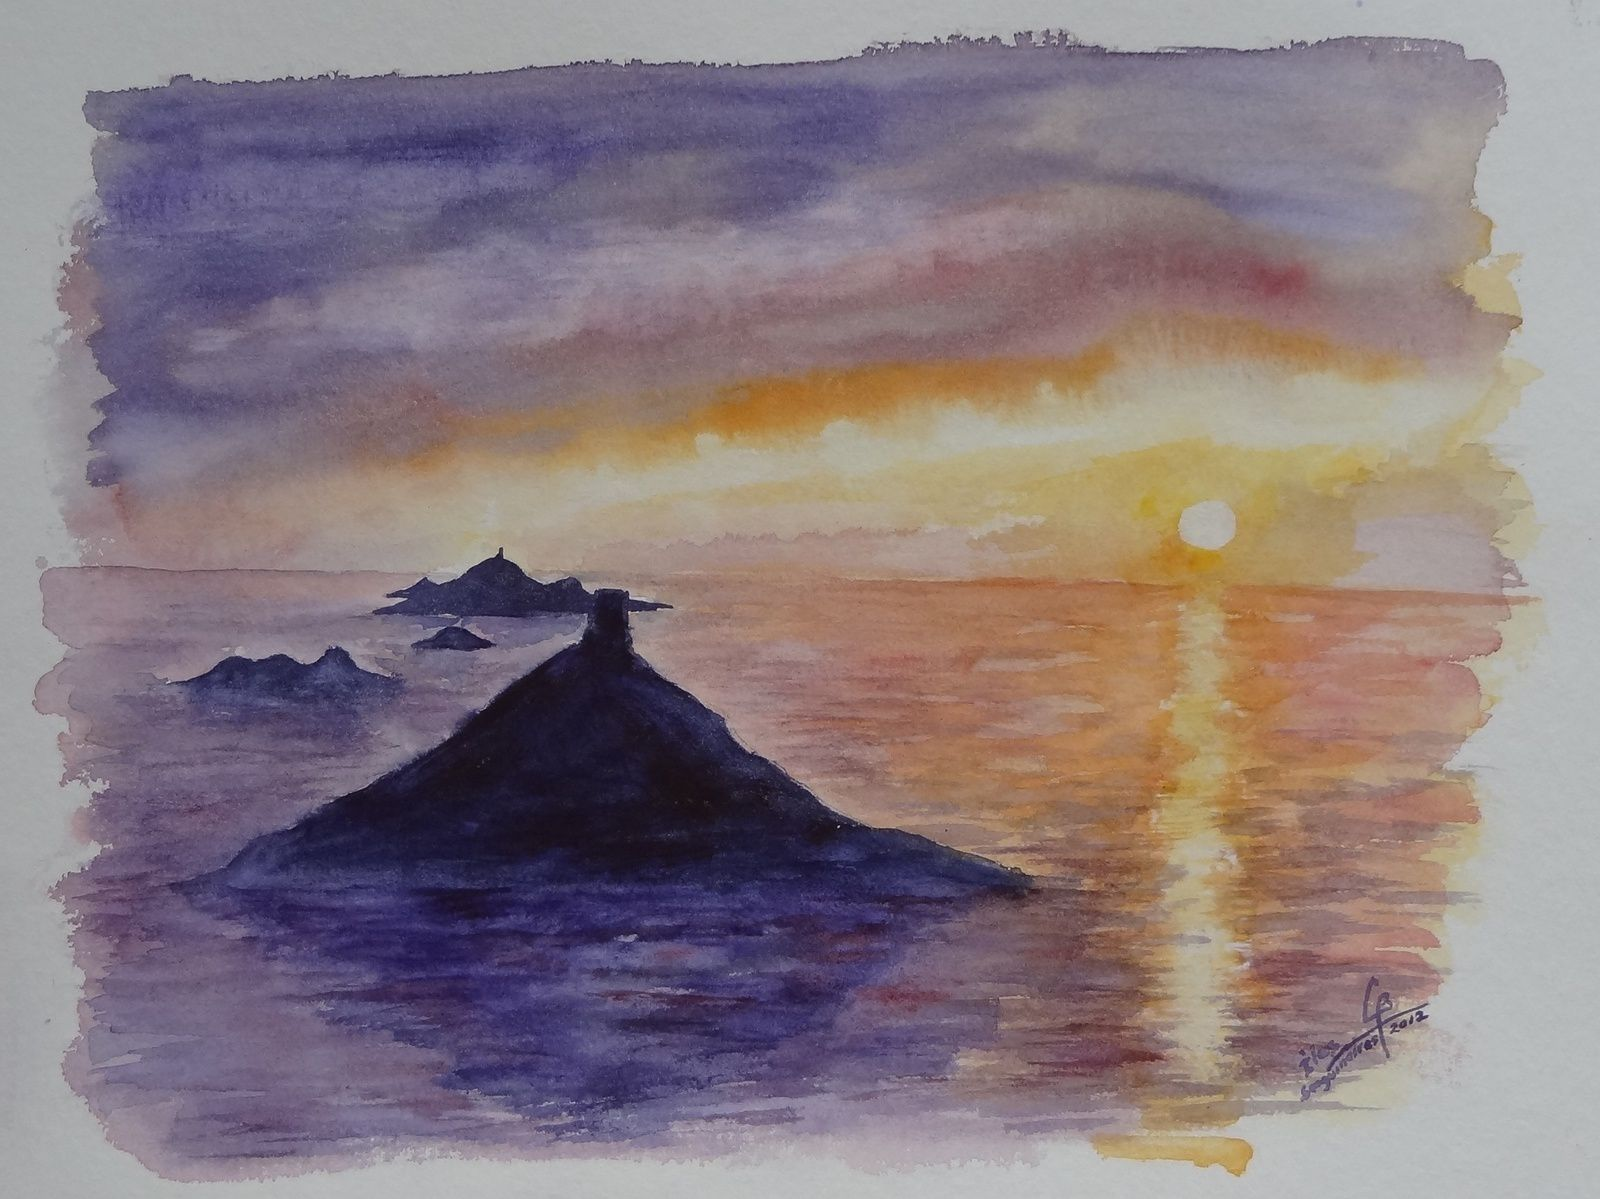 claude_coucher soleil ile sanguinaire_aquarelle